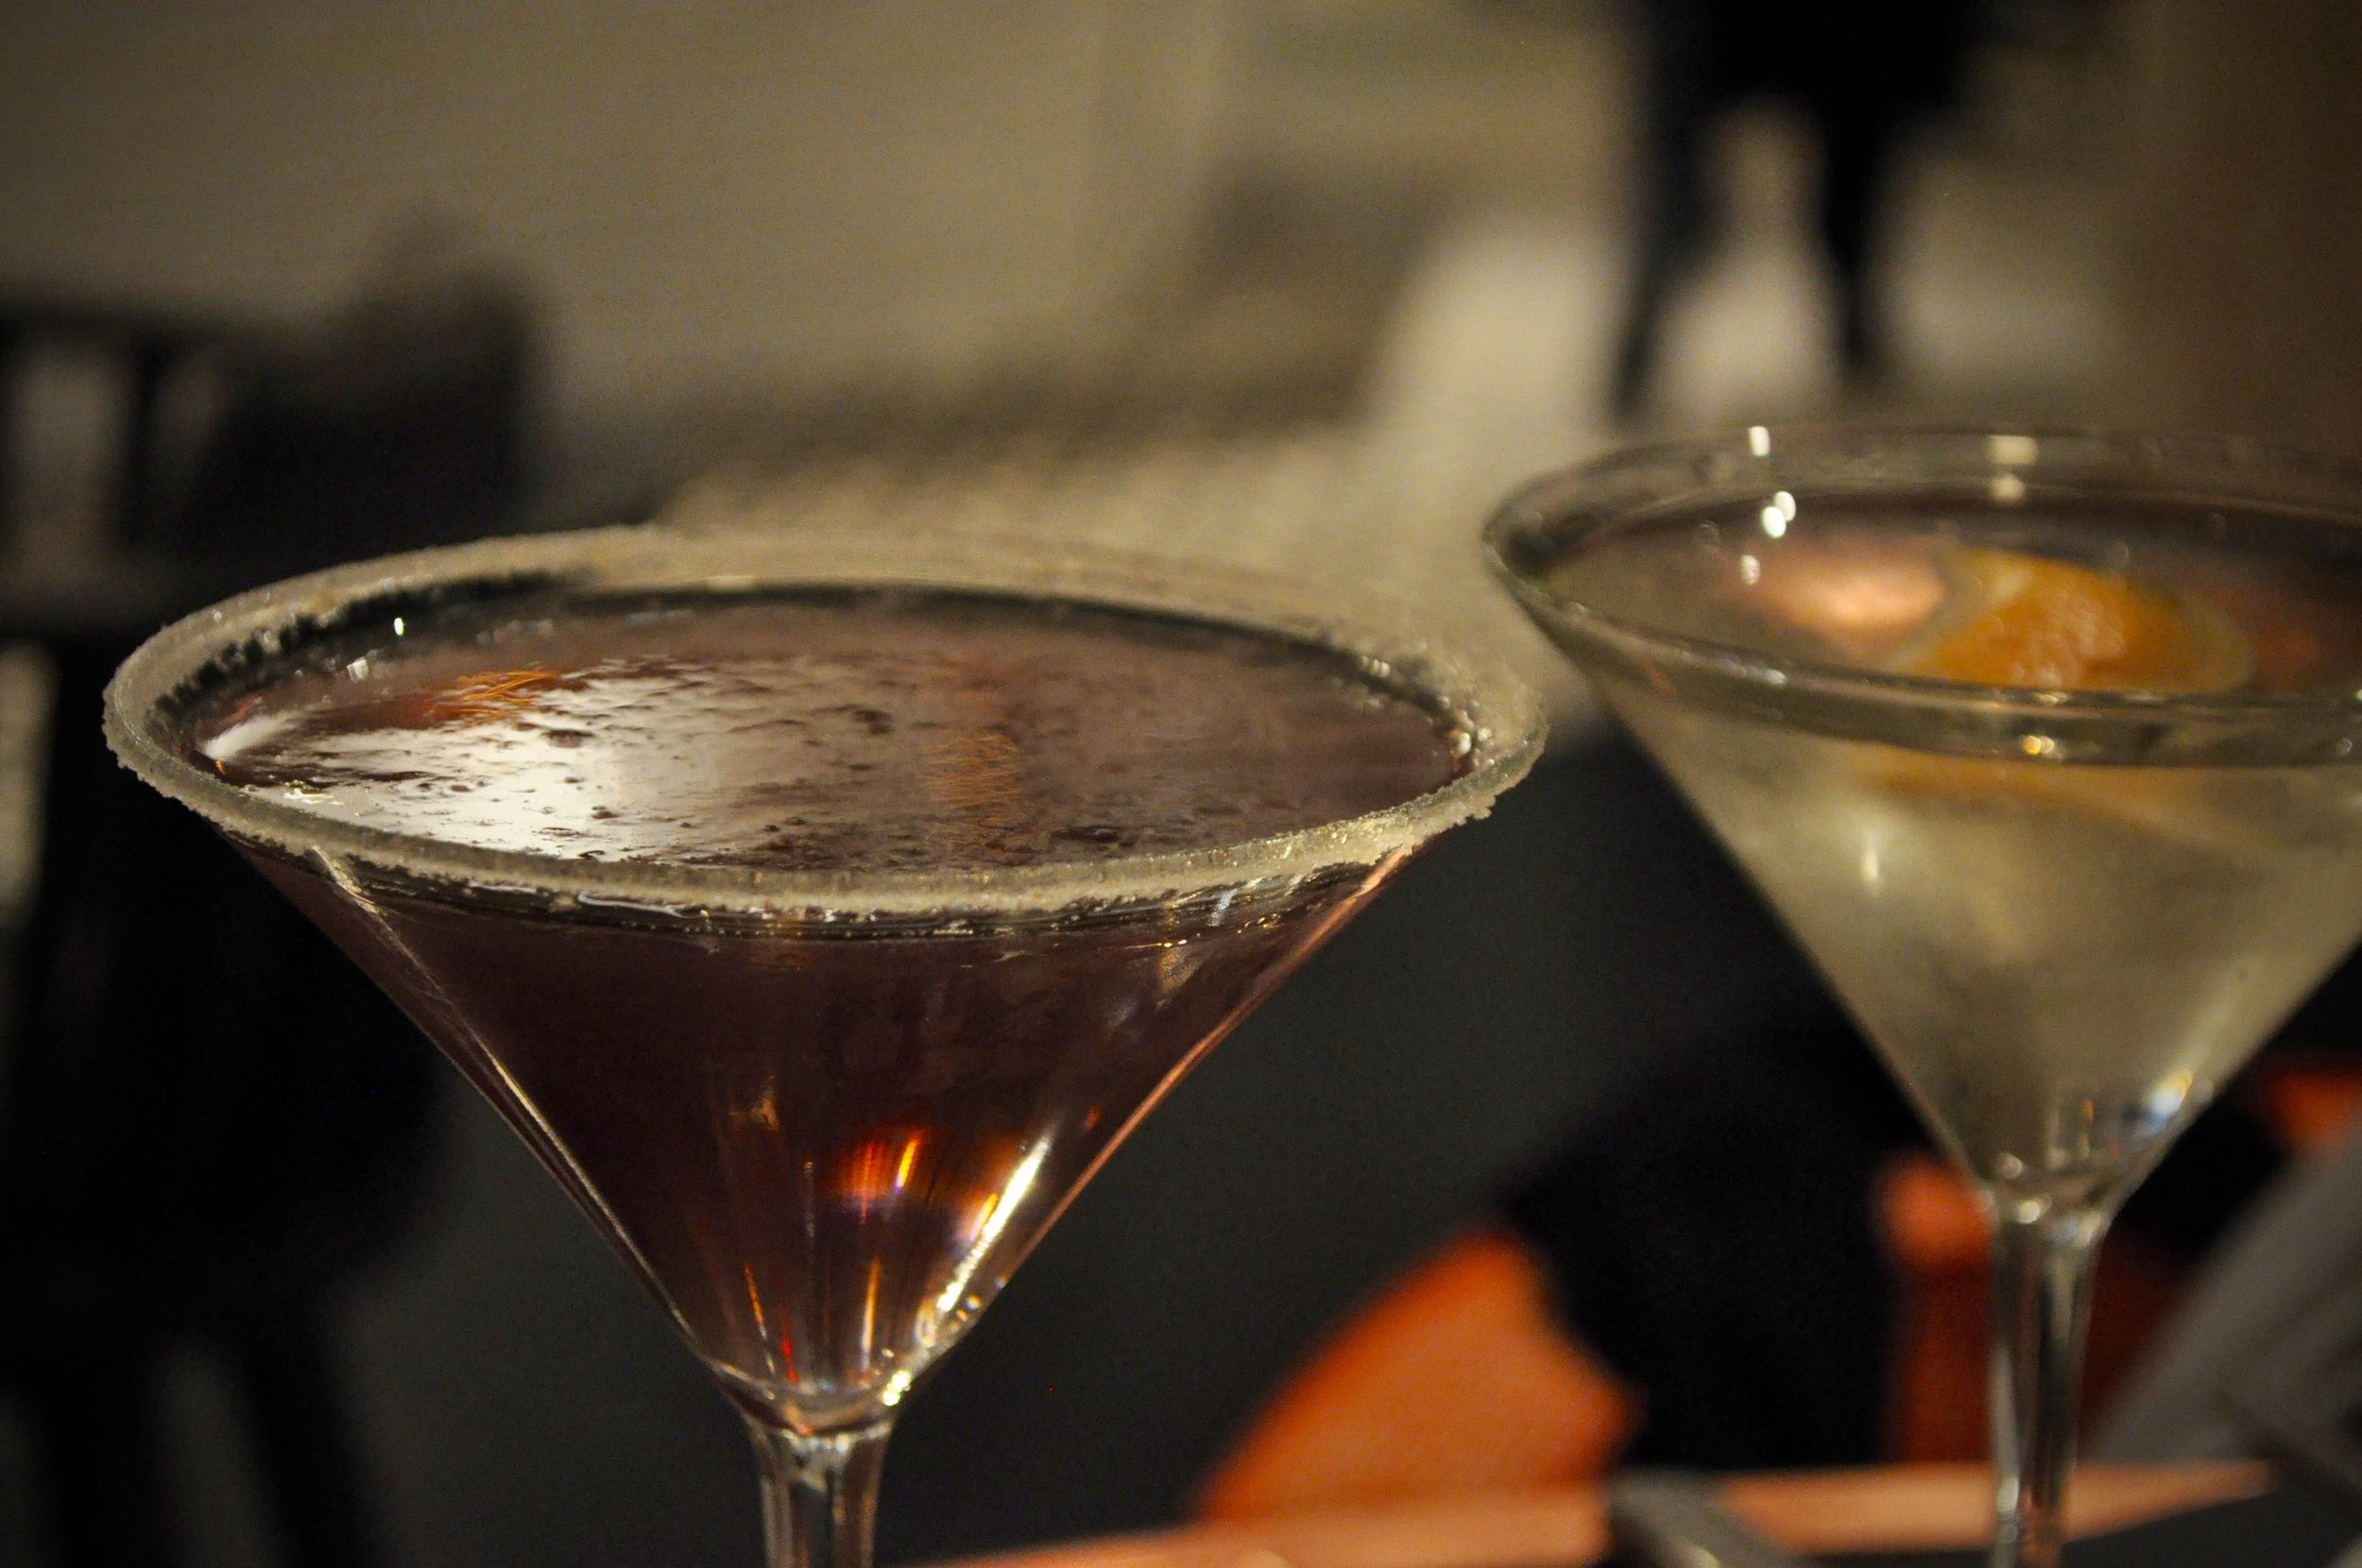 Craft Cocktails: Lavender Breeze & Pear Blossom